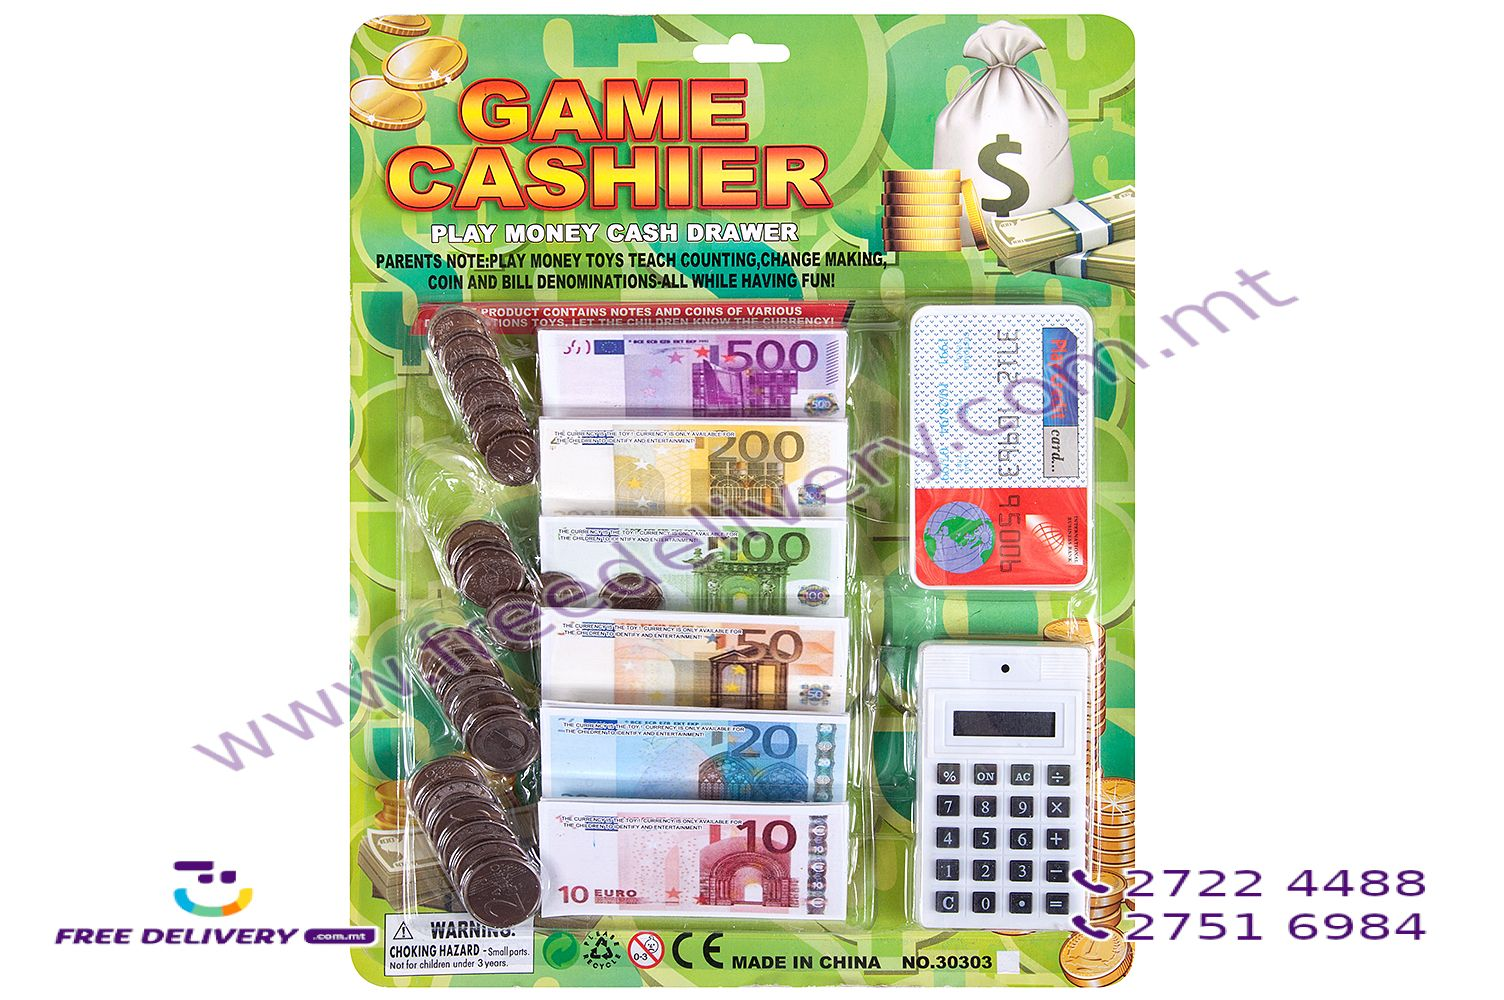 GAME CASHIER MONEY PLAY CALCULATOR – TO303037